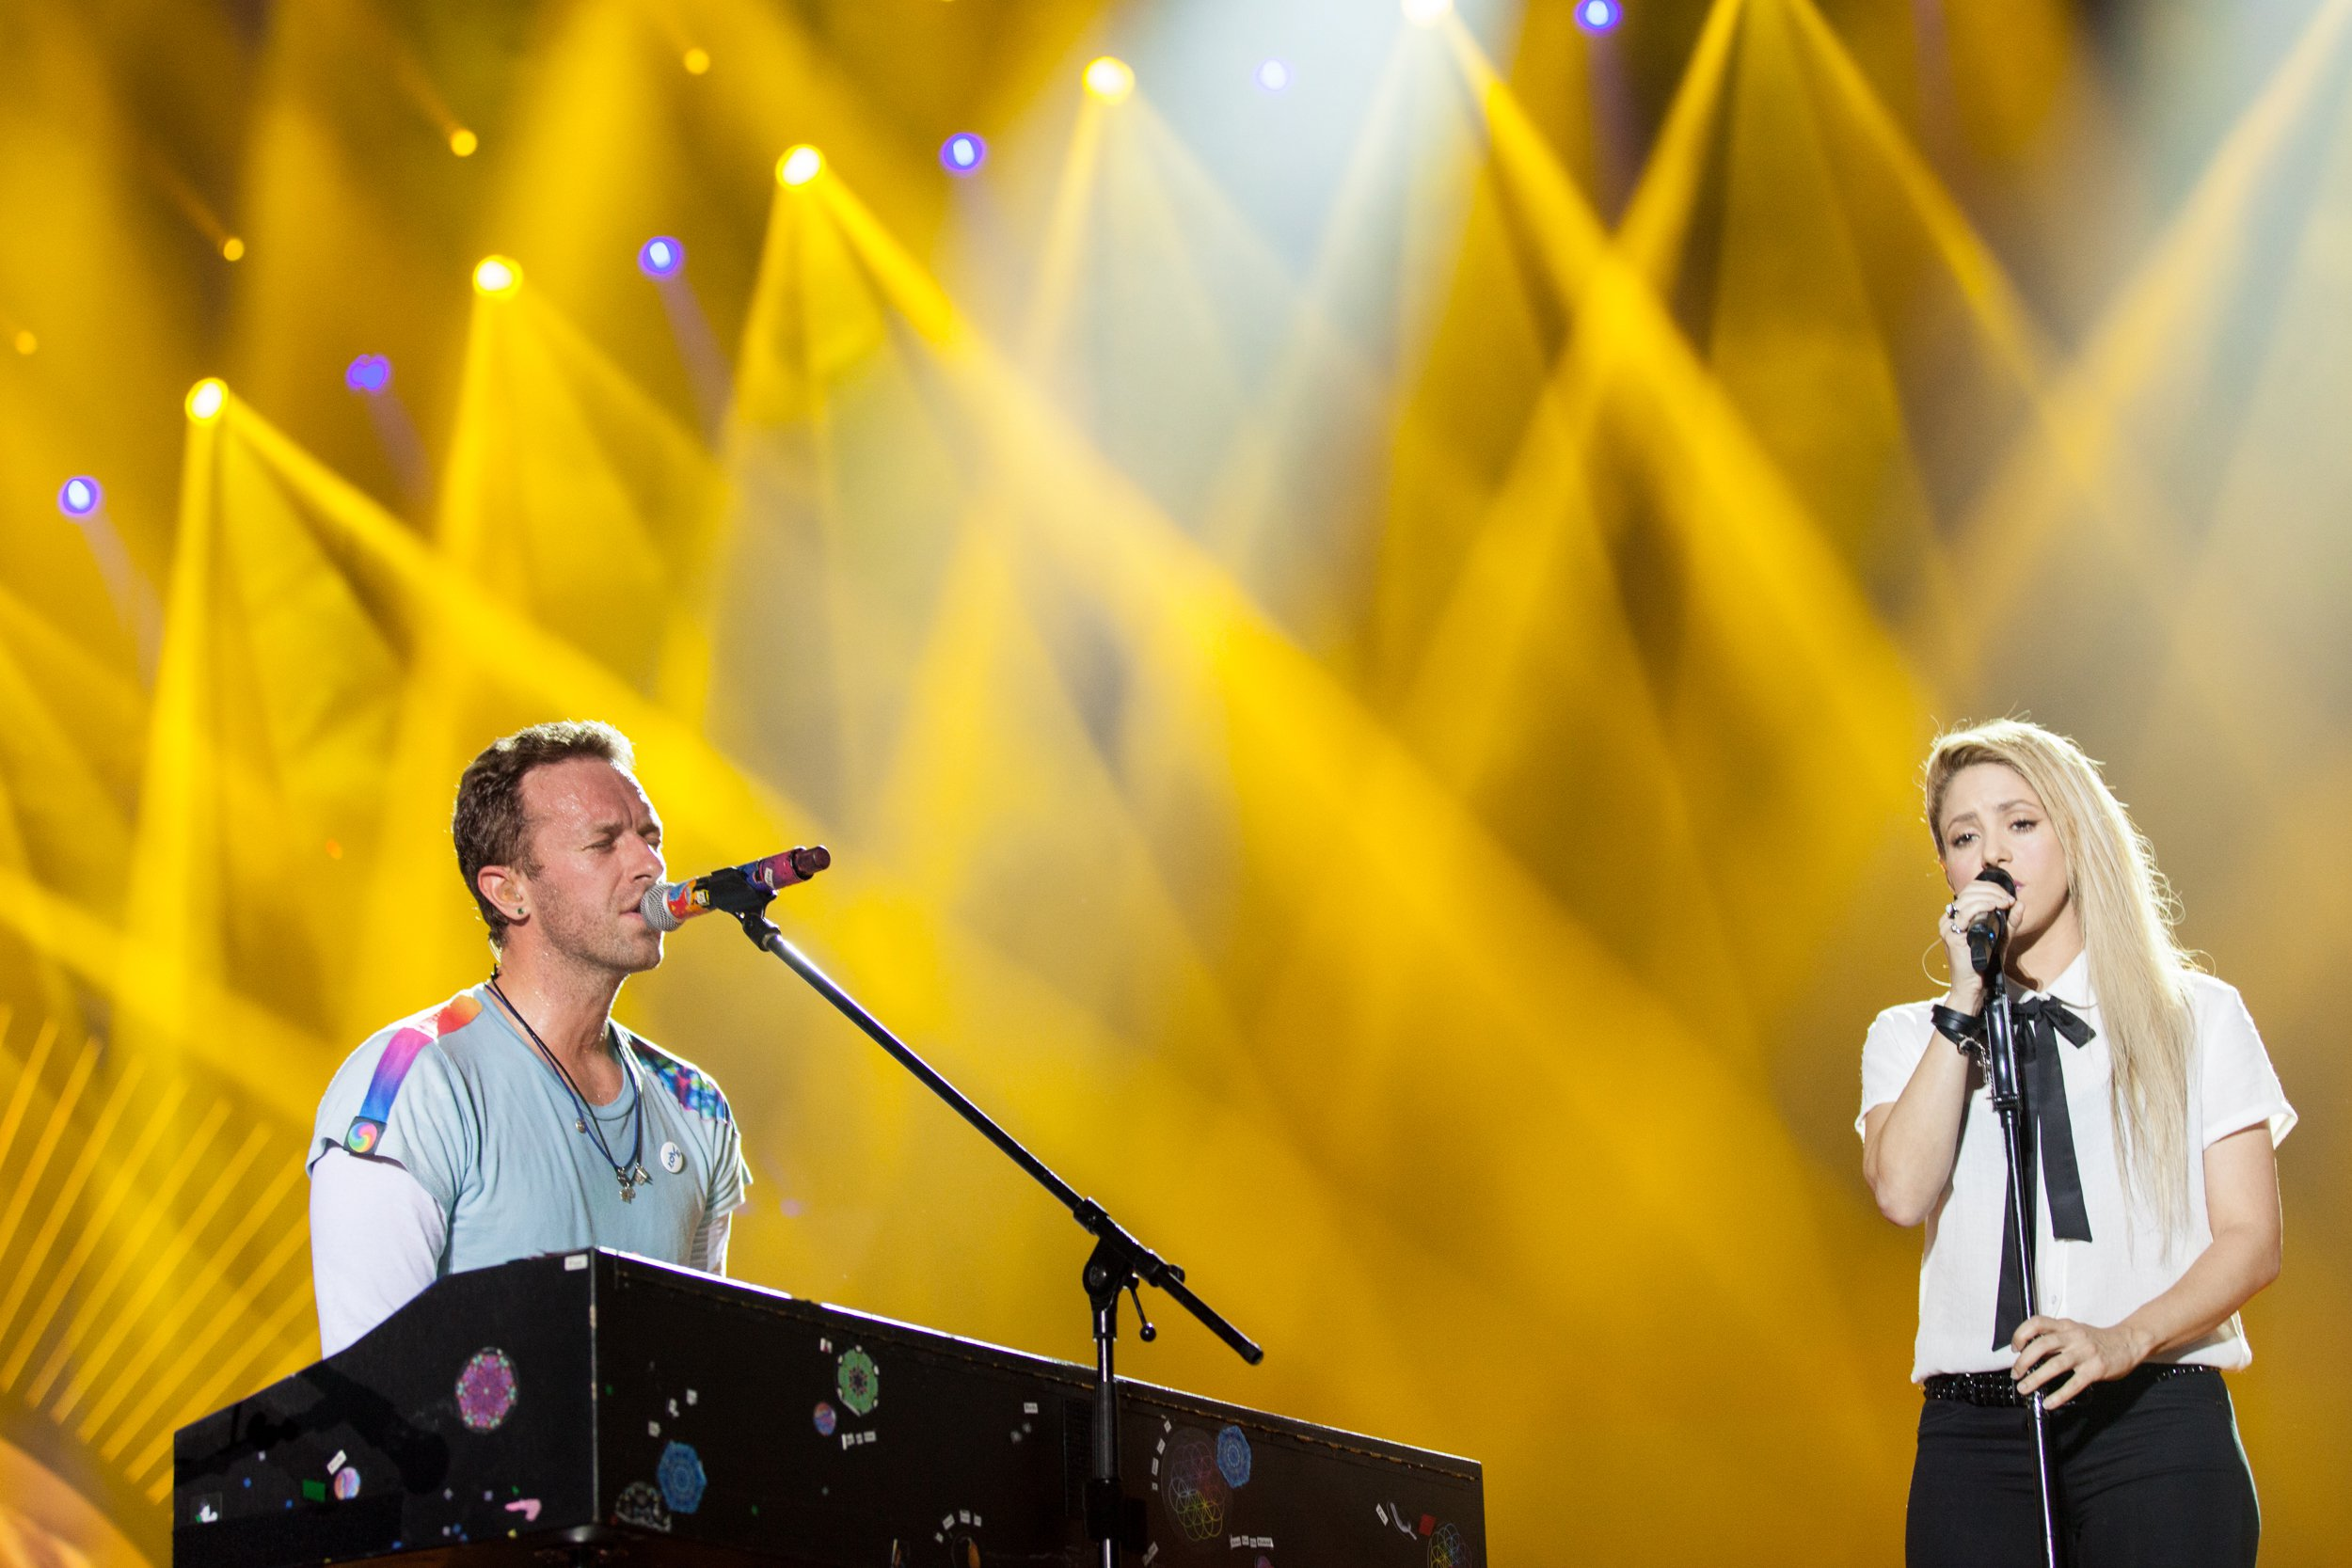 Hamburg_Coldplay_Shakira_GreyHuttonForGlobalCitizen_2.jpg